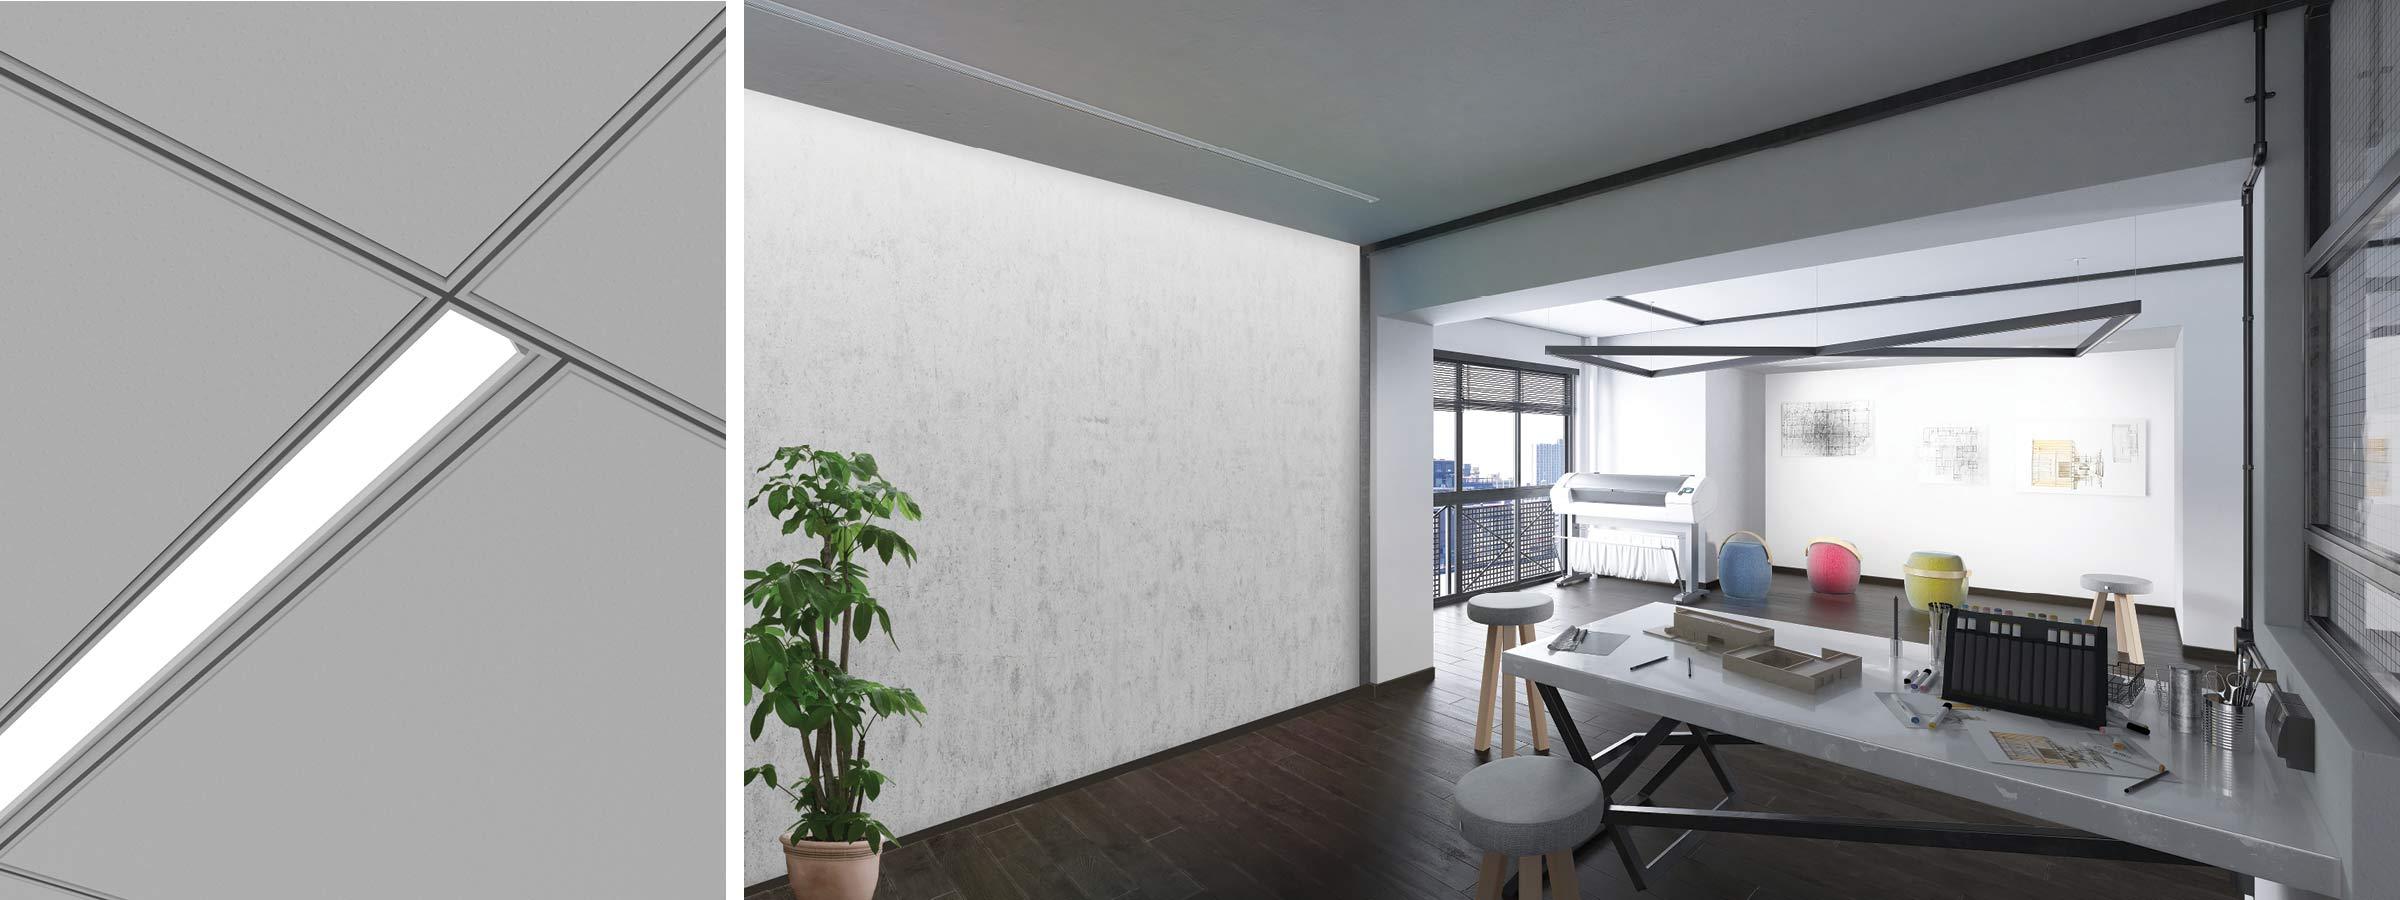 Wall Wash Perfekt Render Pendant AP Architects Office HERO